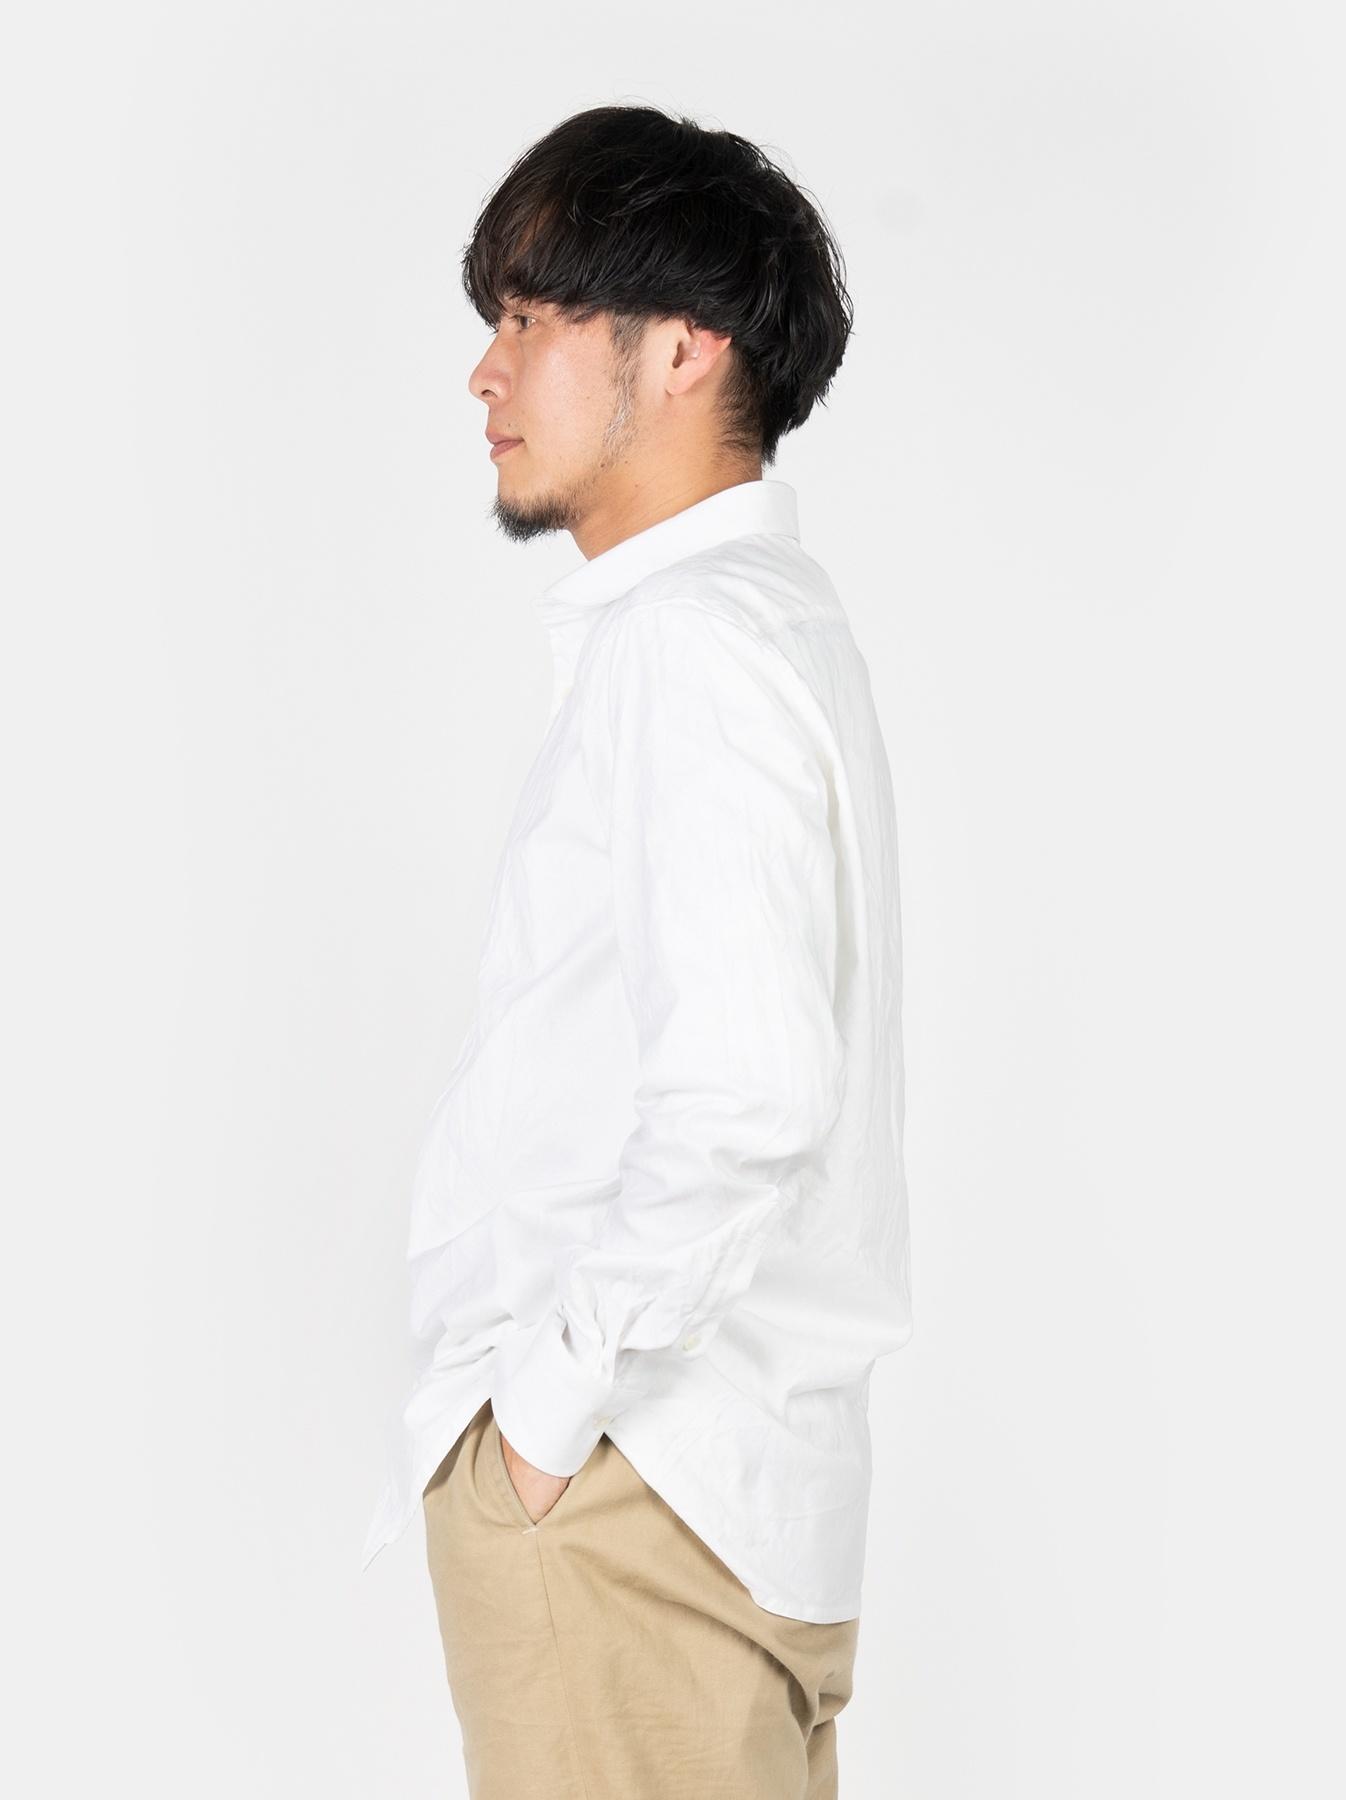 WH Oxford 908 Round Collar Shirt-4